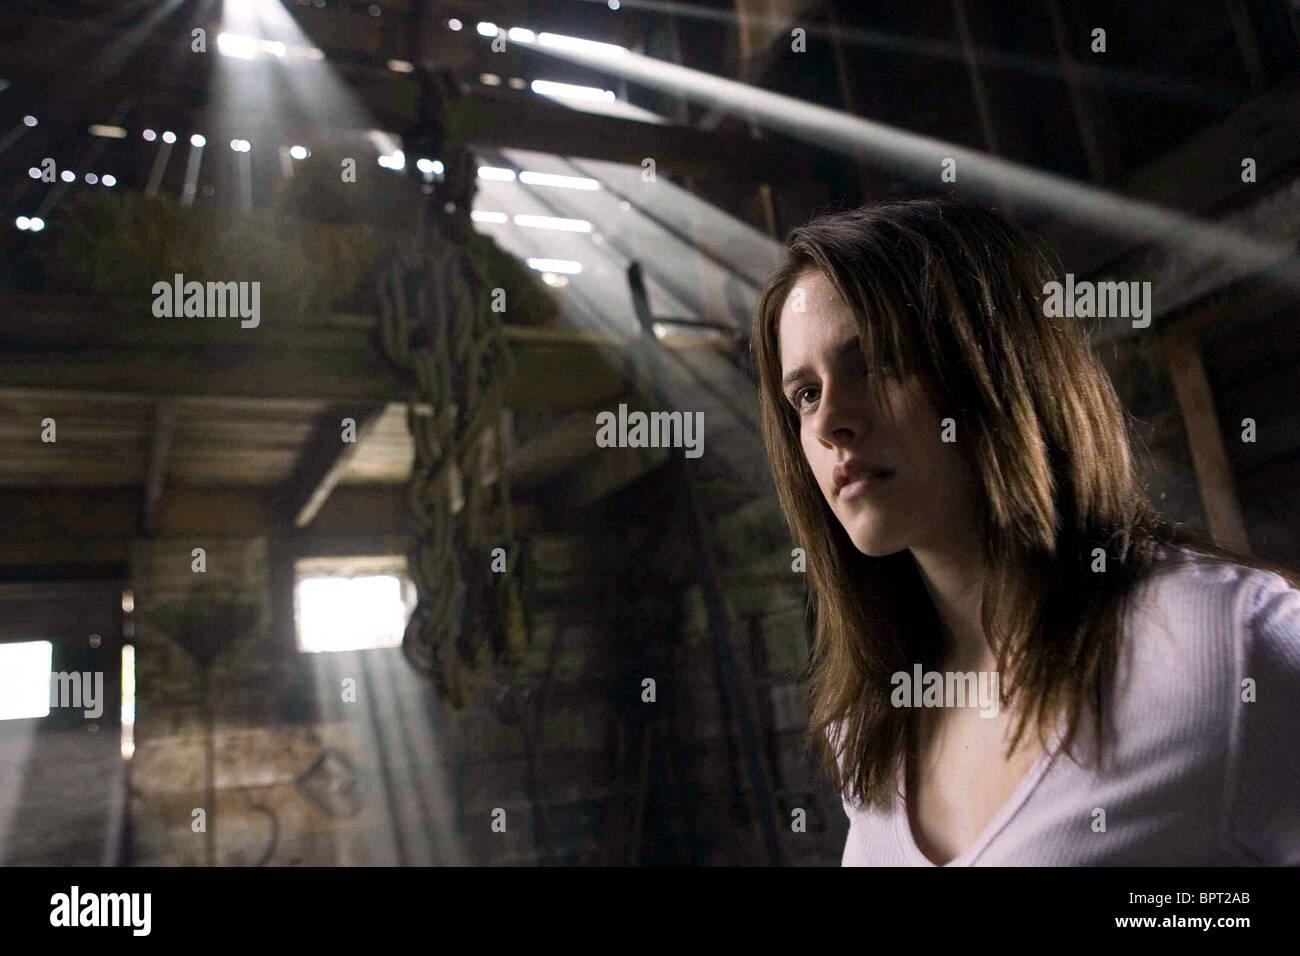 KRISTEN STEWART THE MESSENGERS (2007) - Stock Image